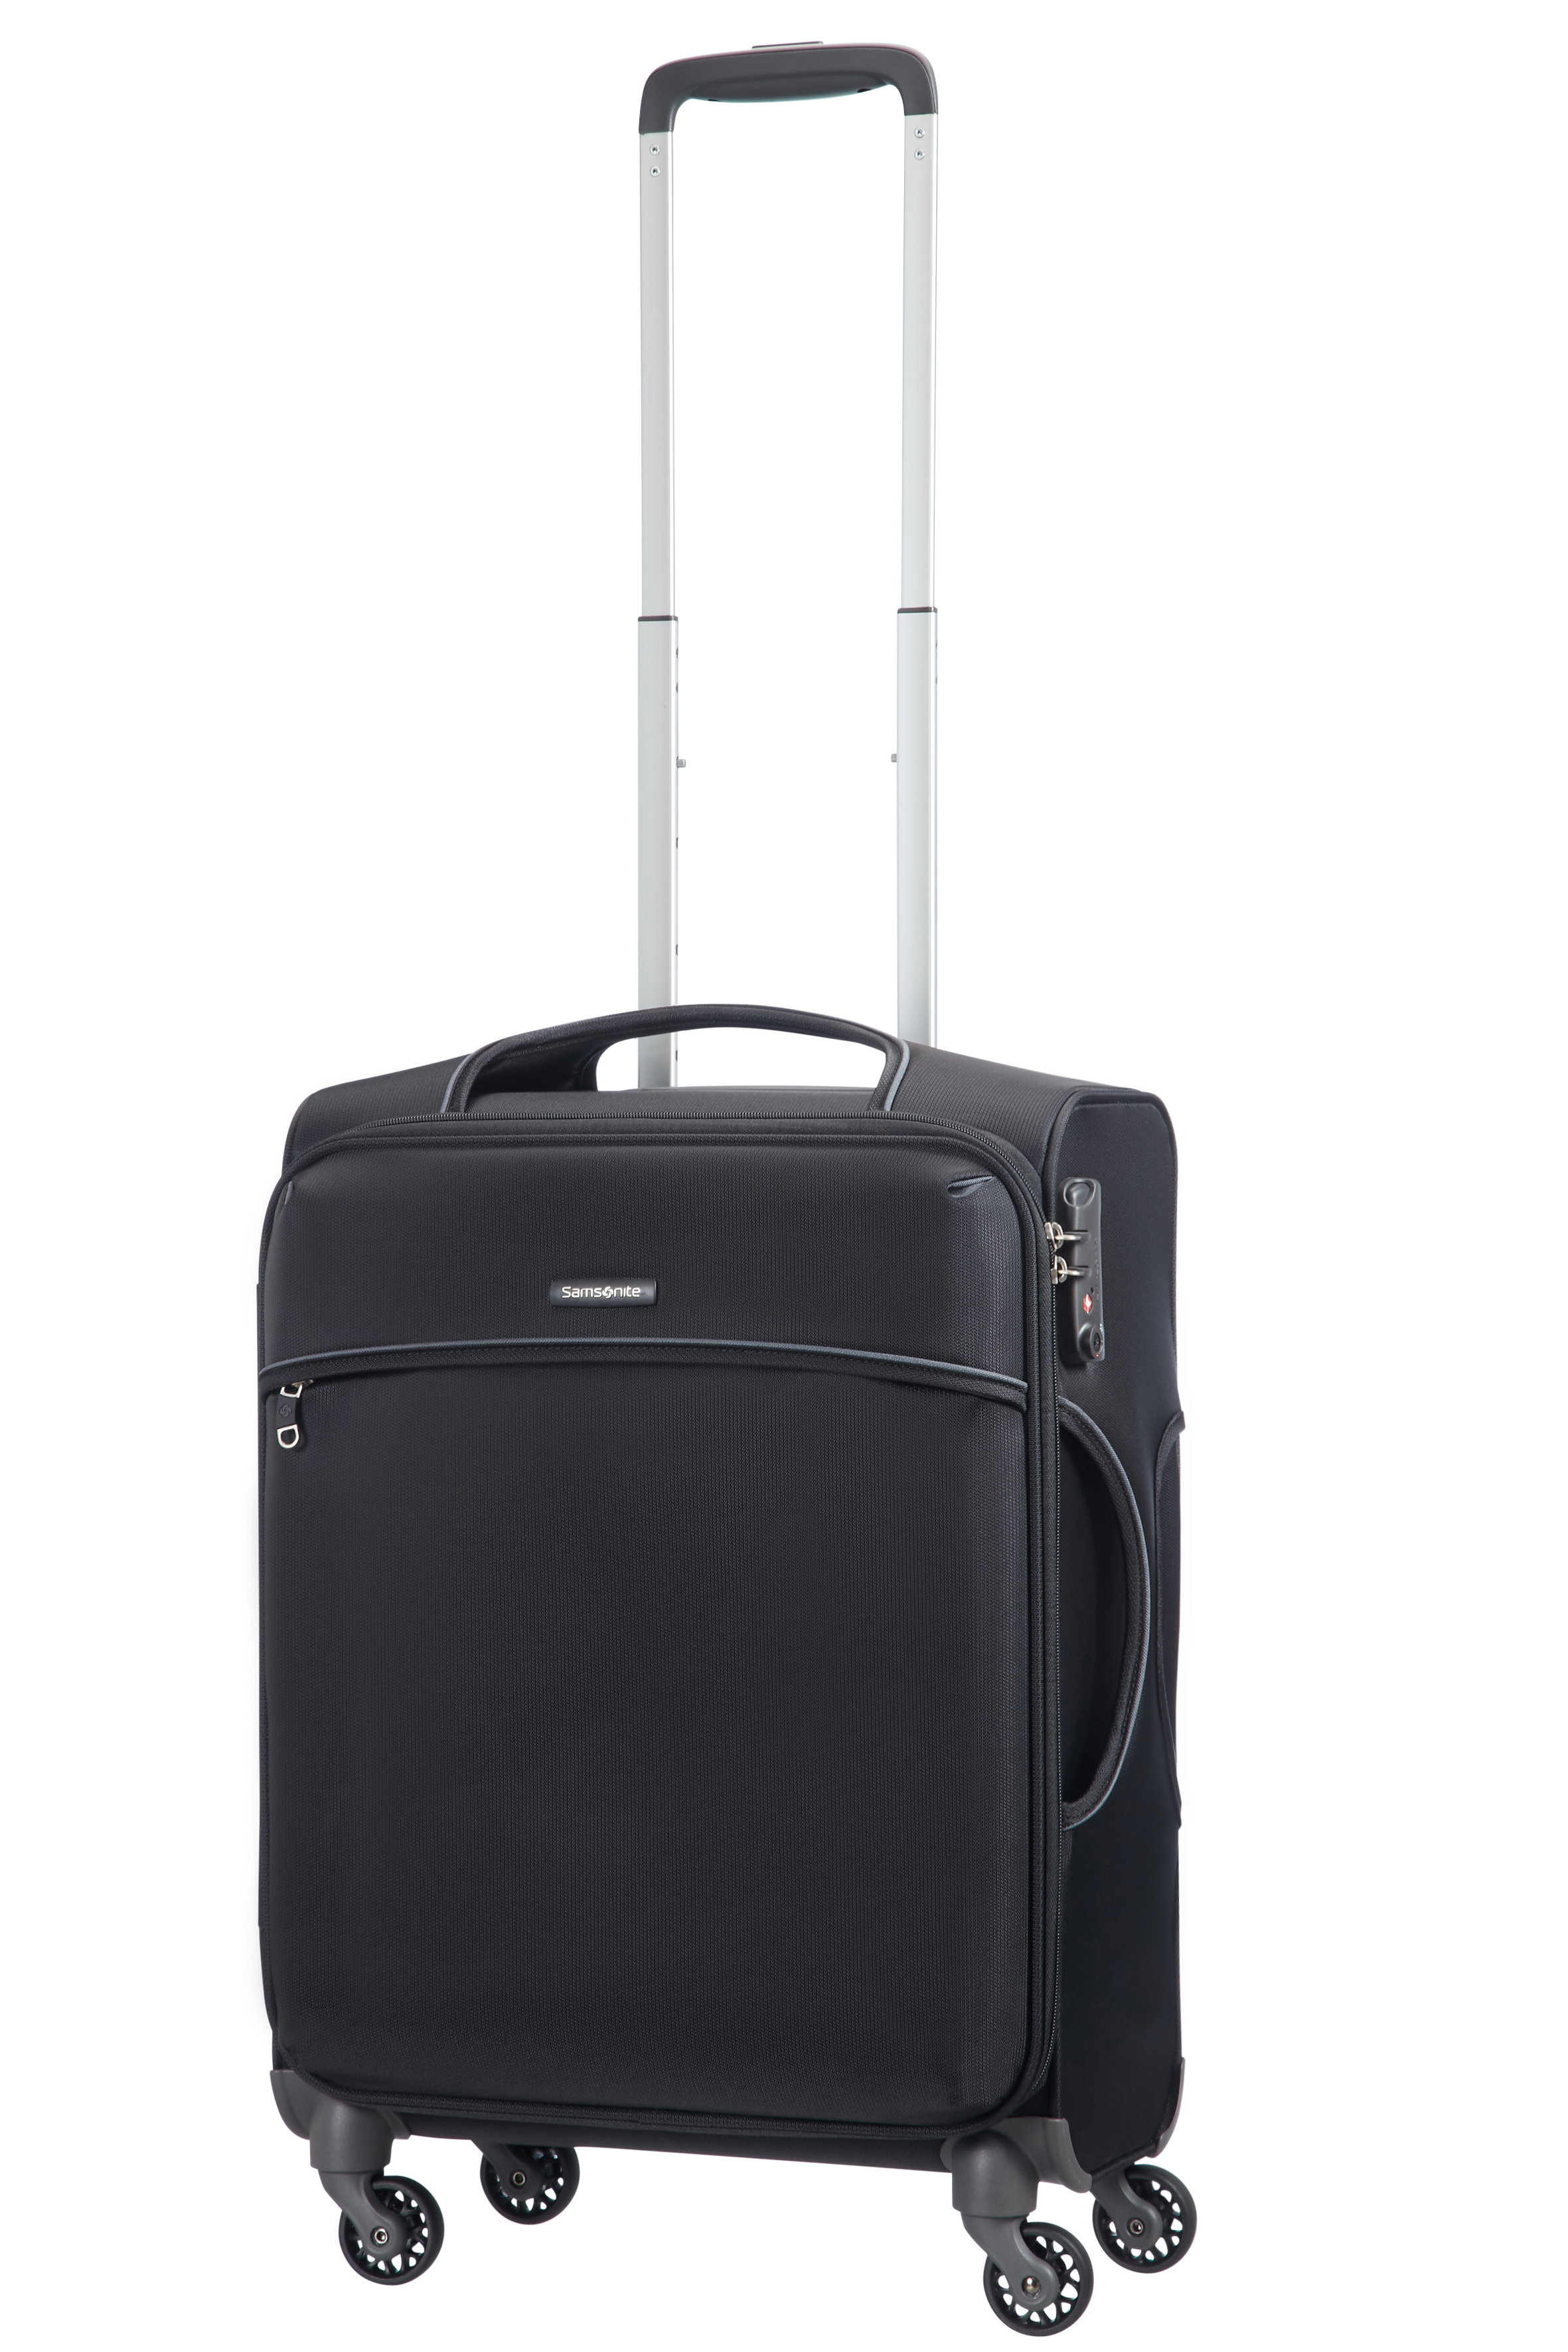 SAMSONITE - Βαλίτσα καμπίνας B-LITE FRESH SPINNER 55/20 μαύρη γυναικεία αξεσουάρ είδη ταξιδίου βαλίτσες καμπίνας